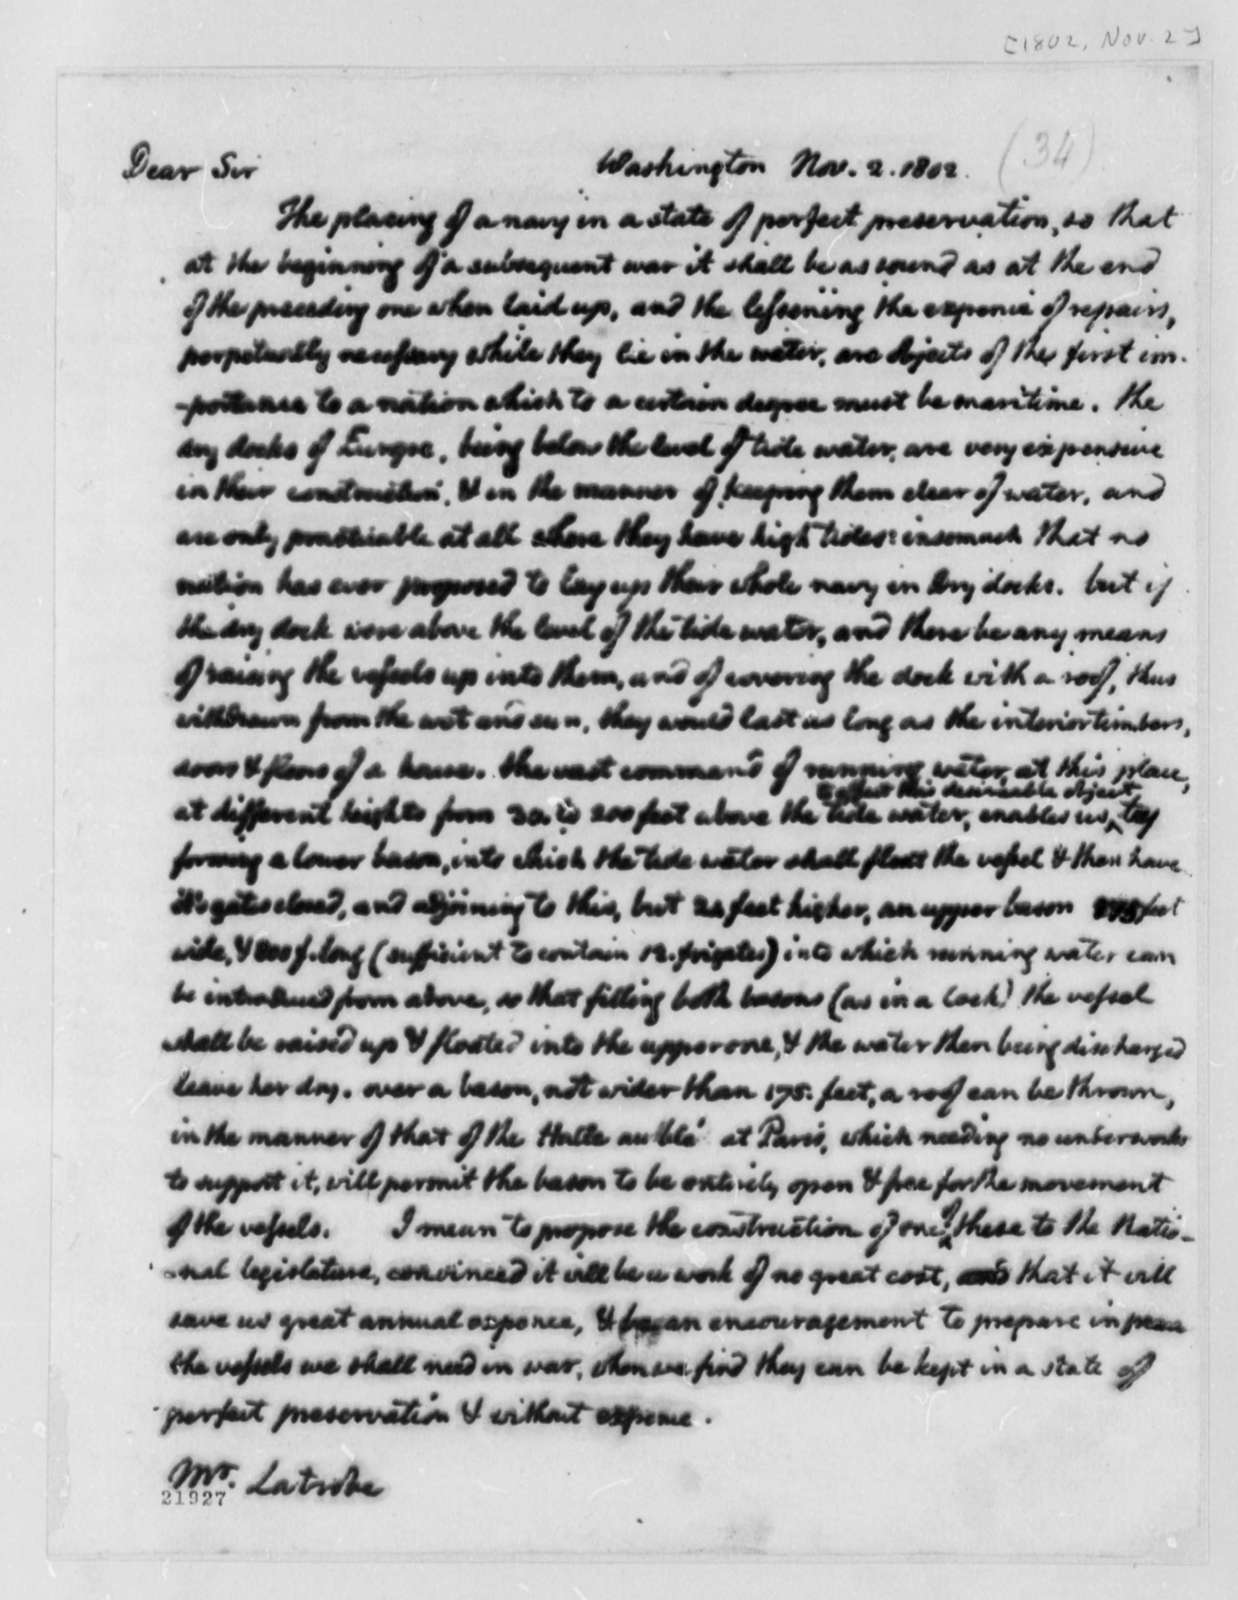 Thomas Jefferson to Benjamin H. Latrobe, November 2, 1802